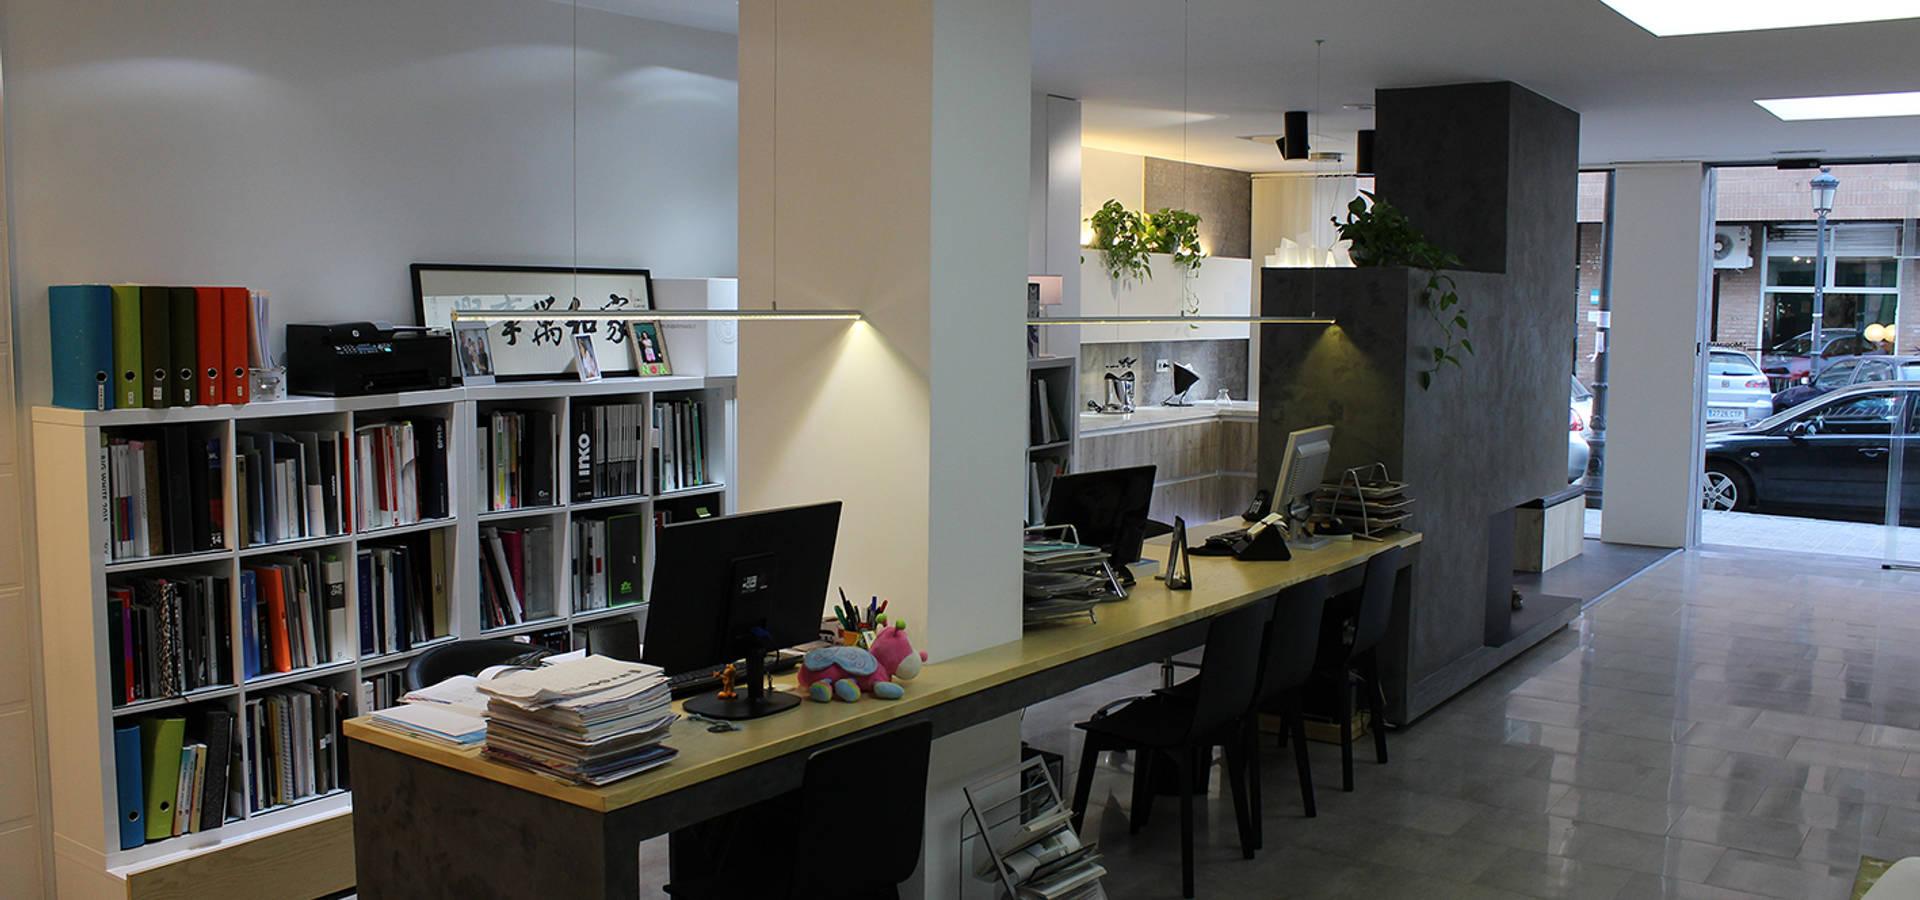 Mobimar interiorismo decoradores y dise adores de - Disenadores en valencia ...